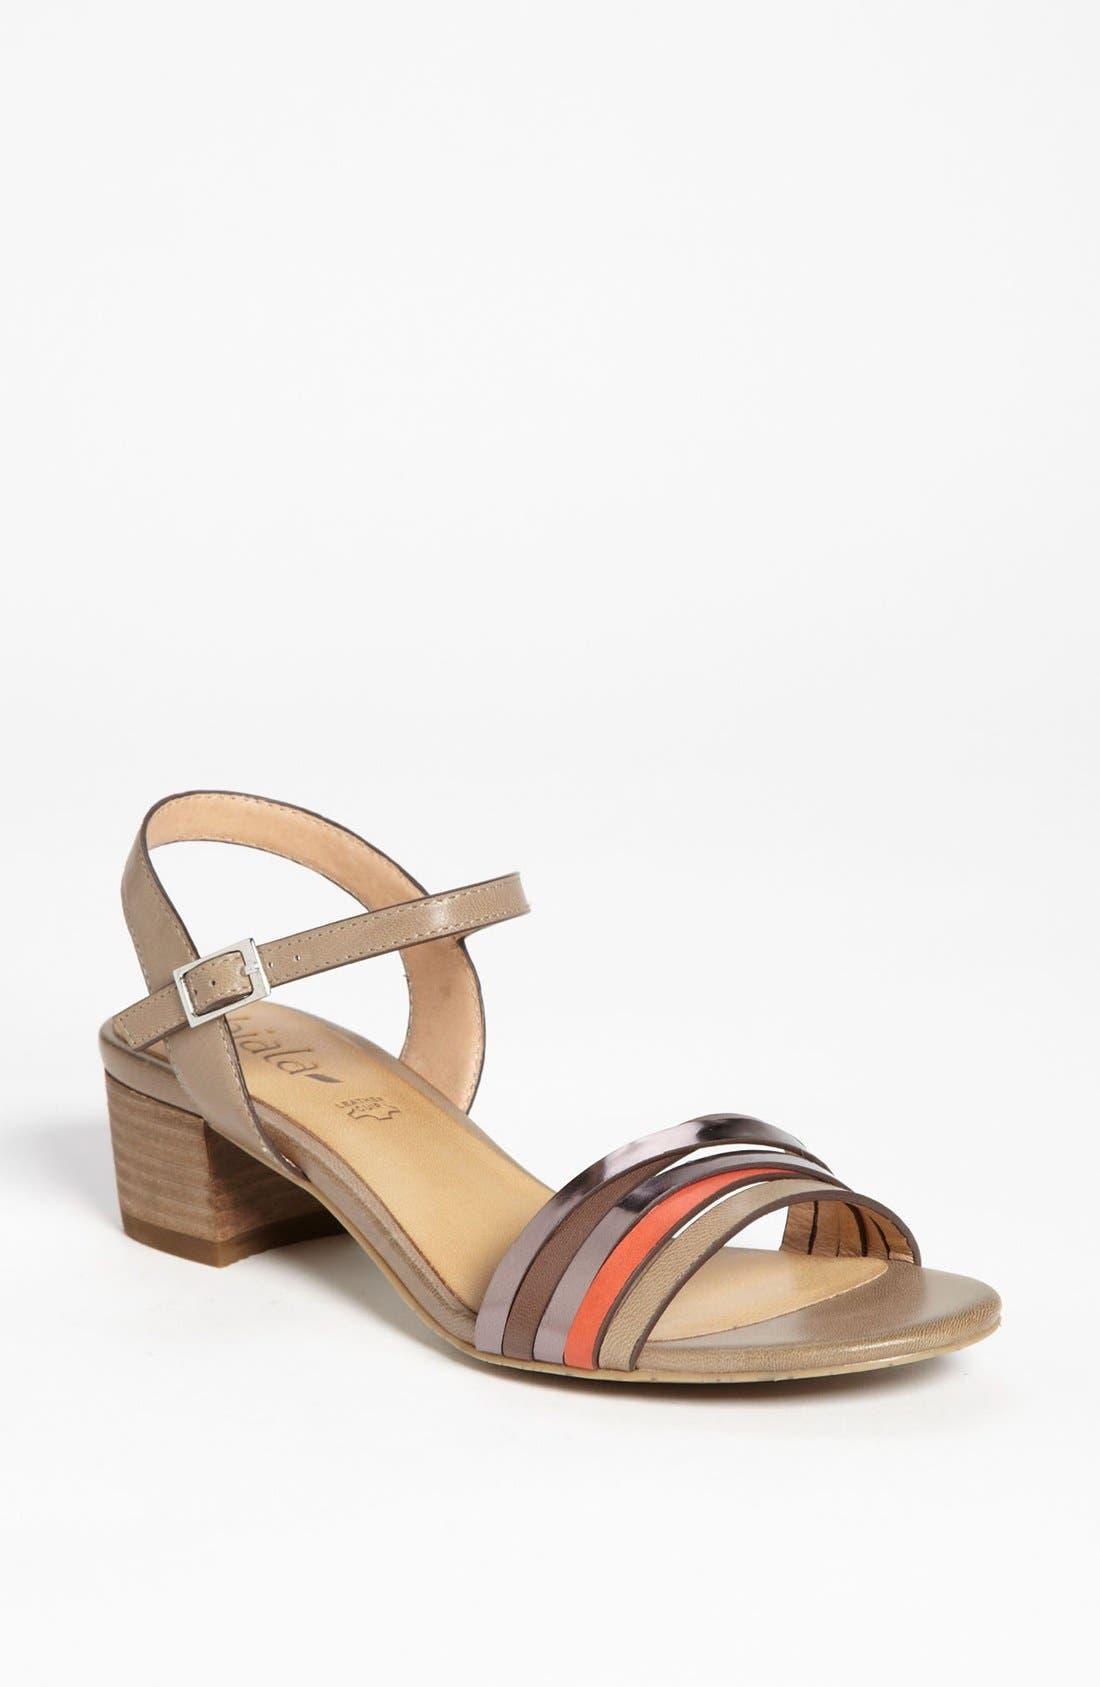 Alternate Image 1 Selected - Biala 'Jade' Sandal